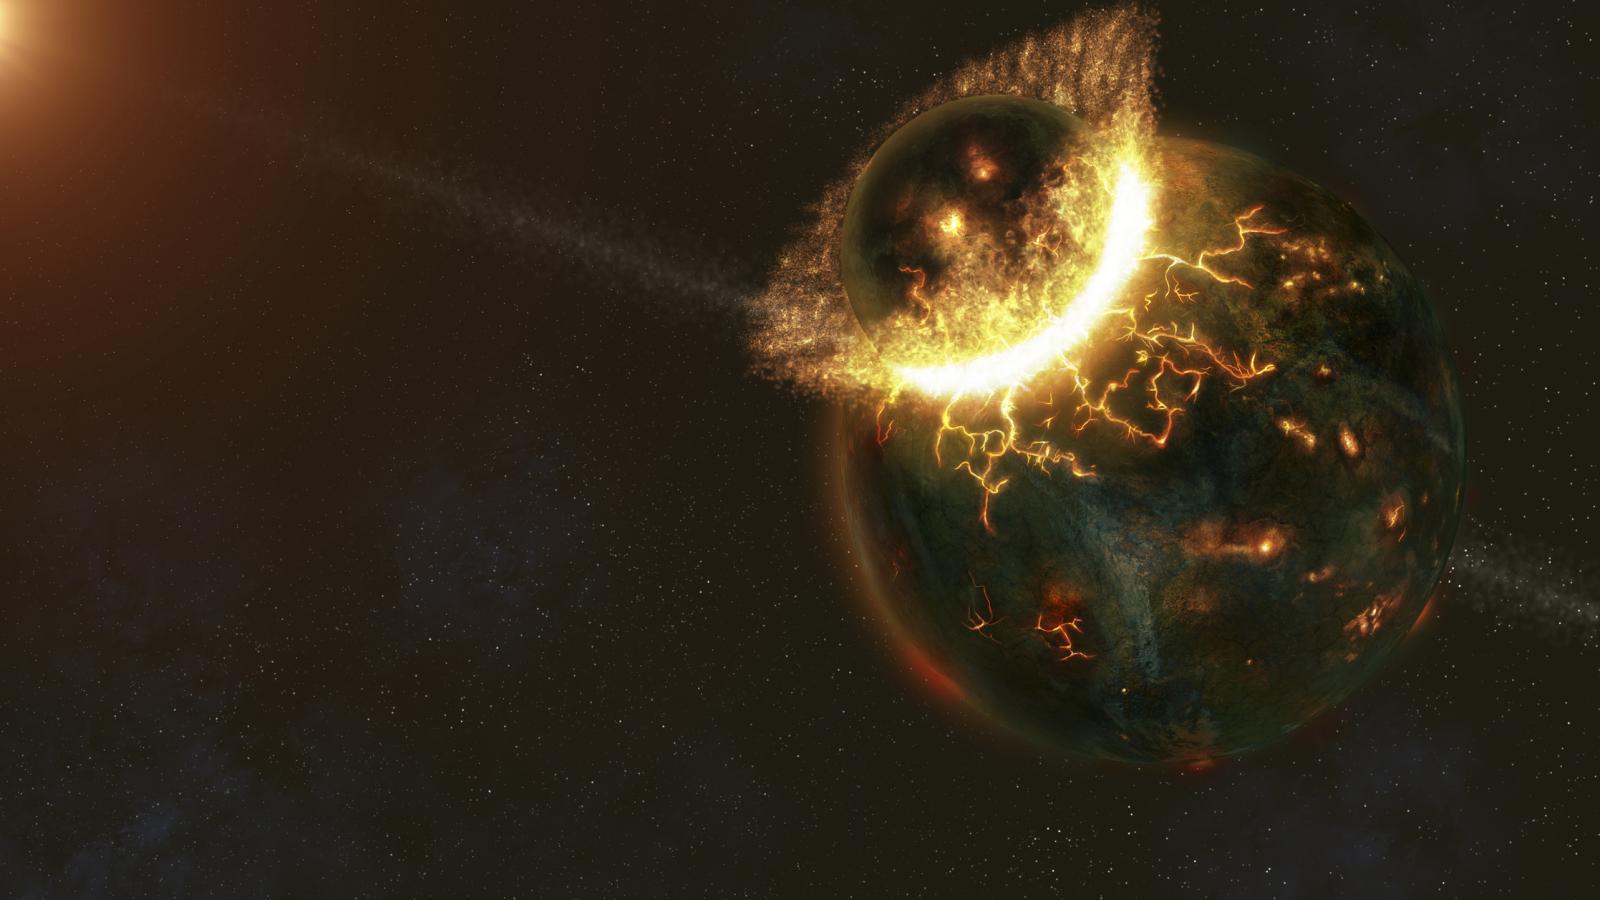 Artist interpretation of Theia's impact on the Earth.